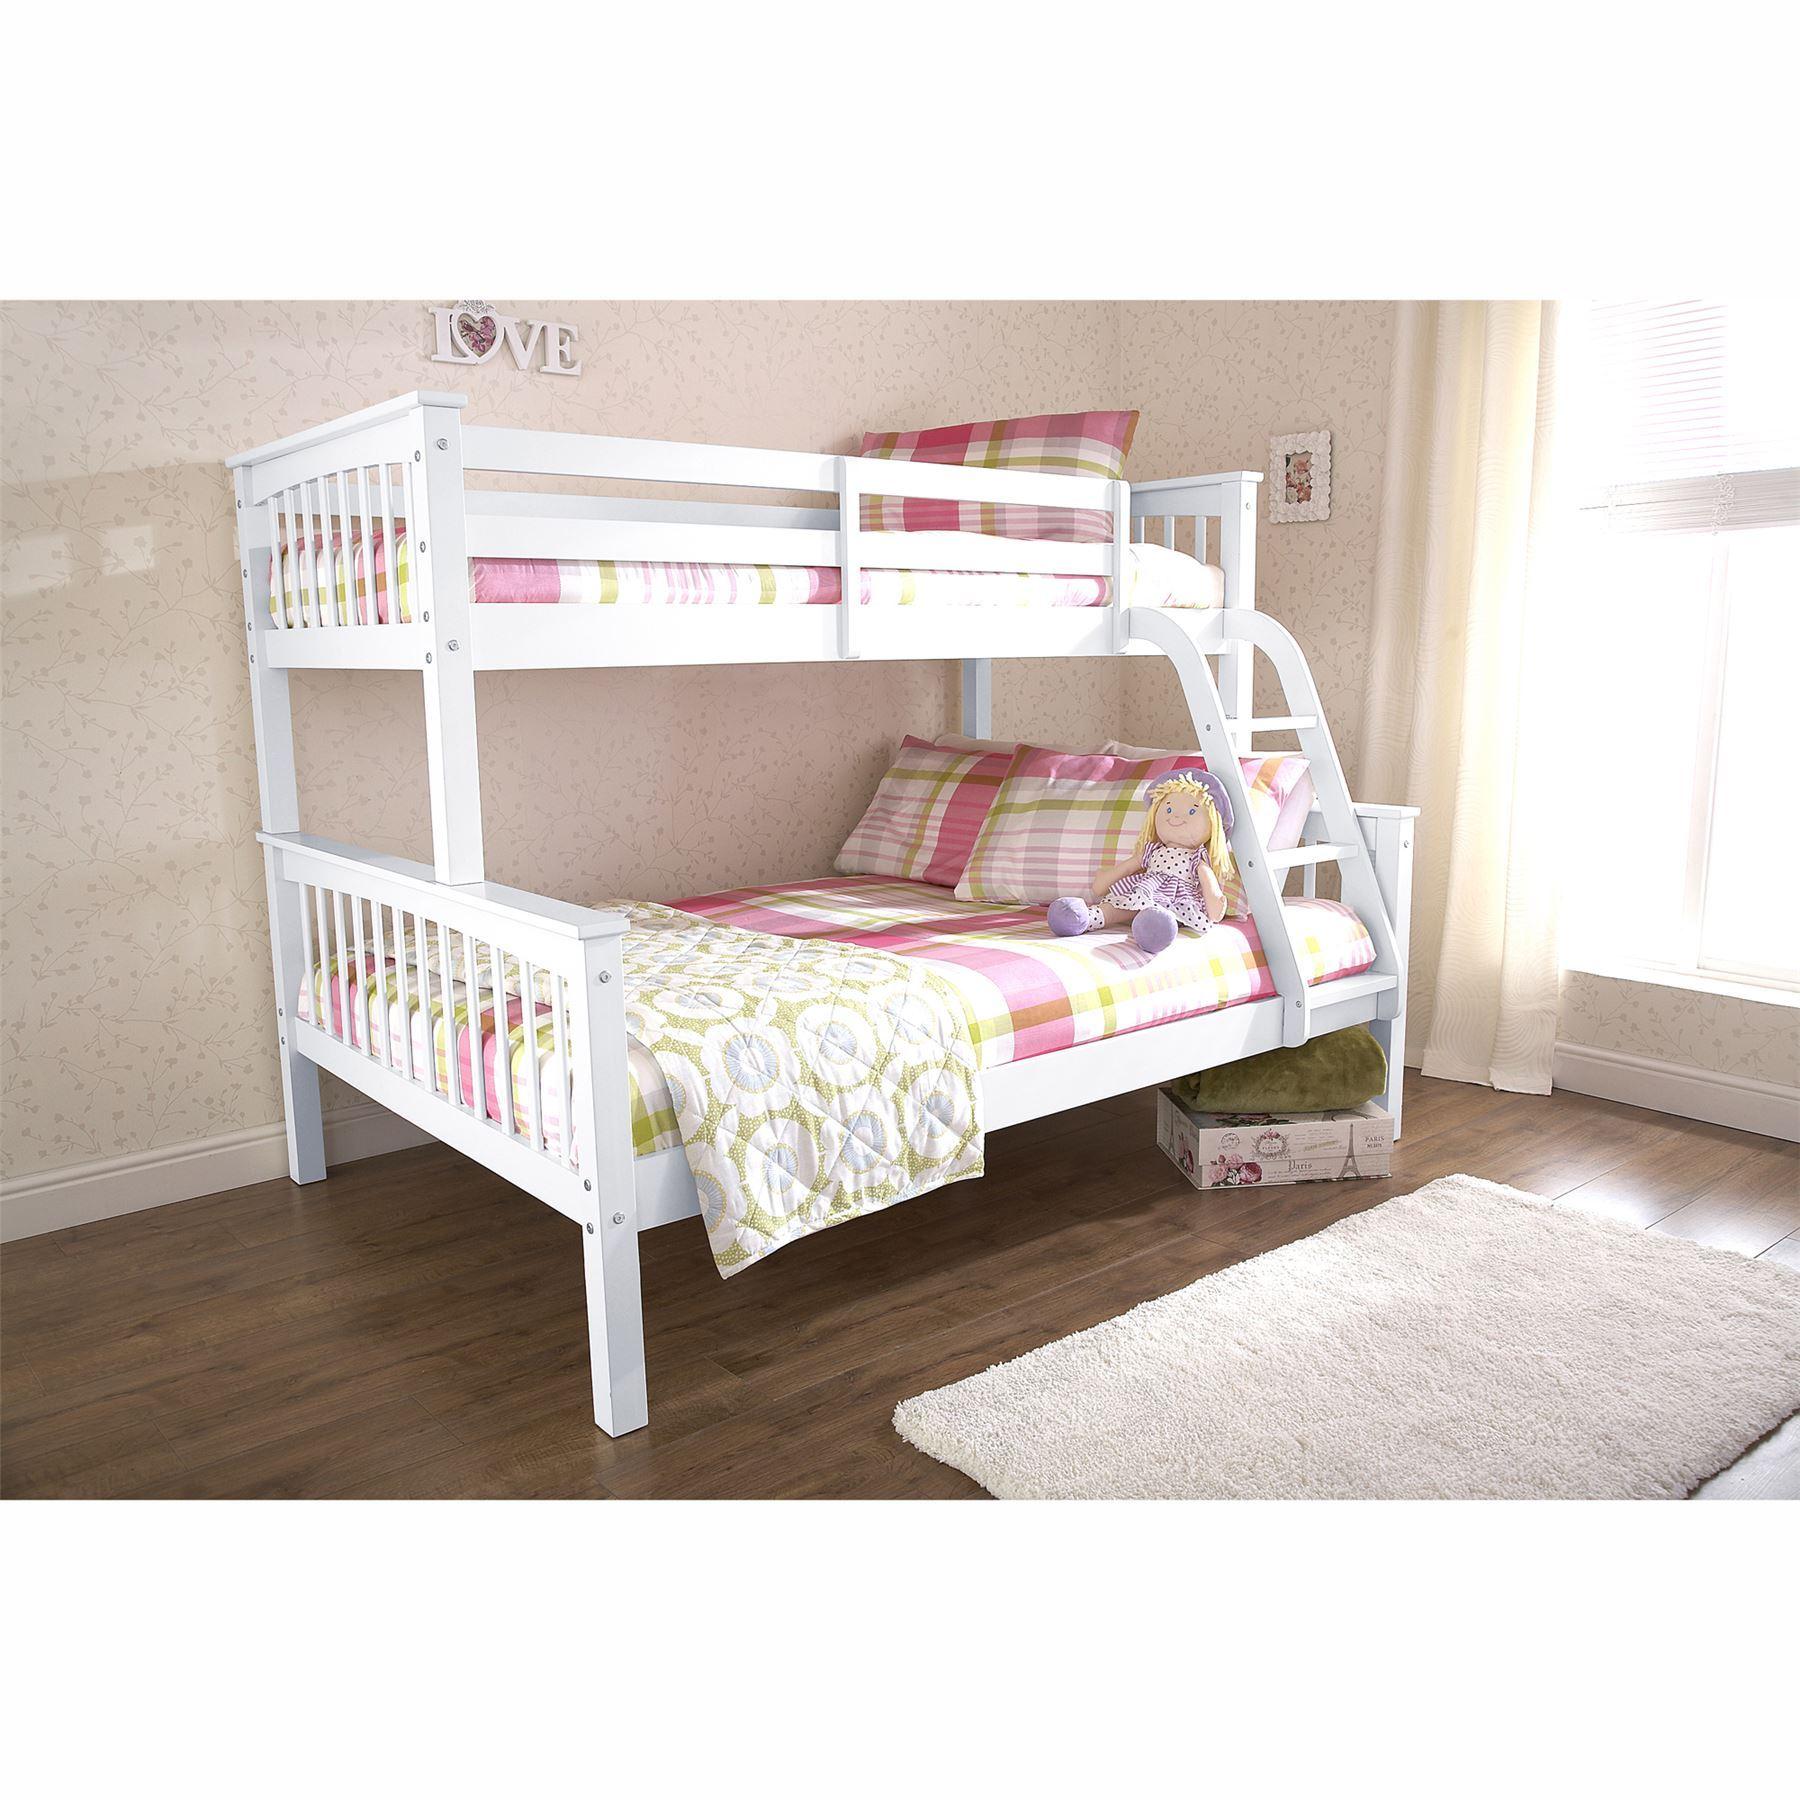 NOVARO TRIO WHITE BUNK BED FRAMES 3FT SINGLE 4FT6 DOUBLE FOR ...